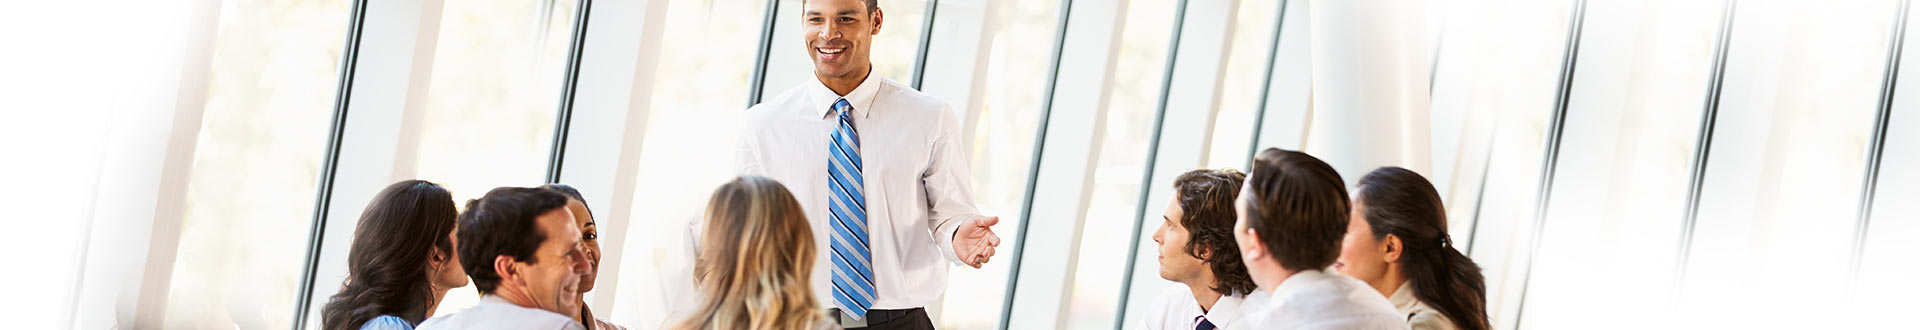 banners_companyoverview_boardofdirectors